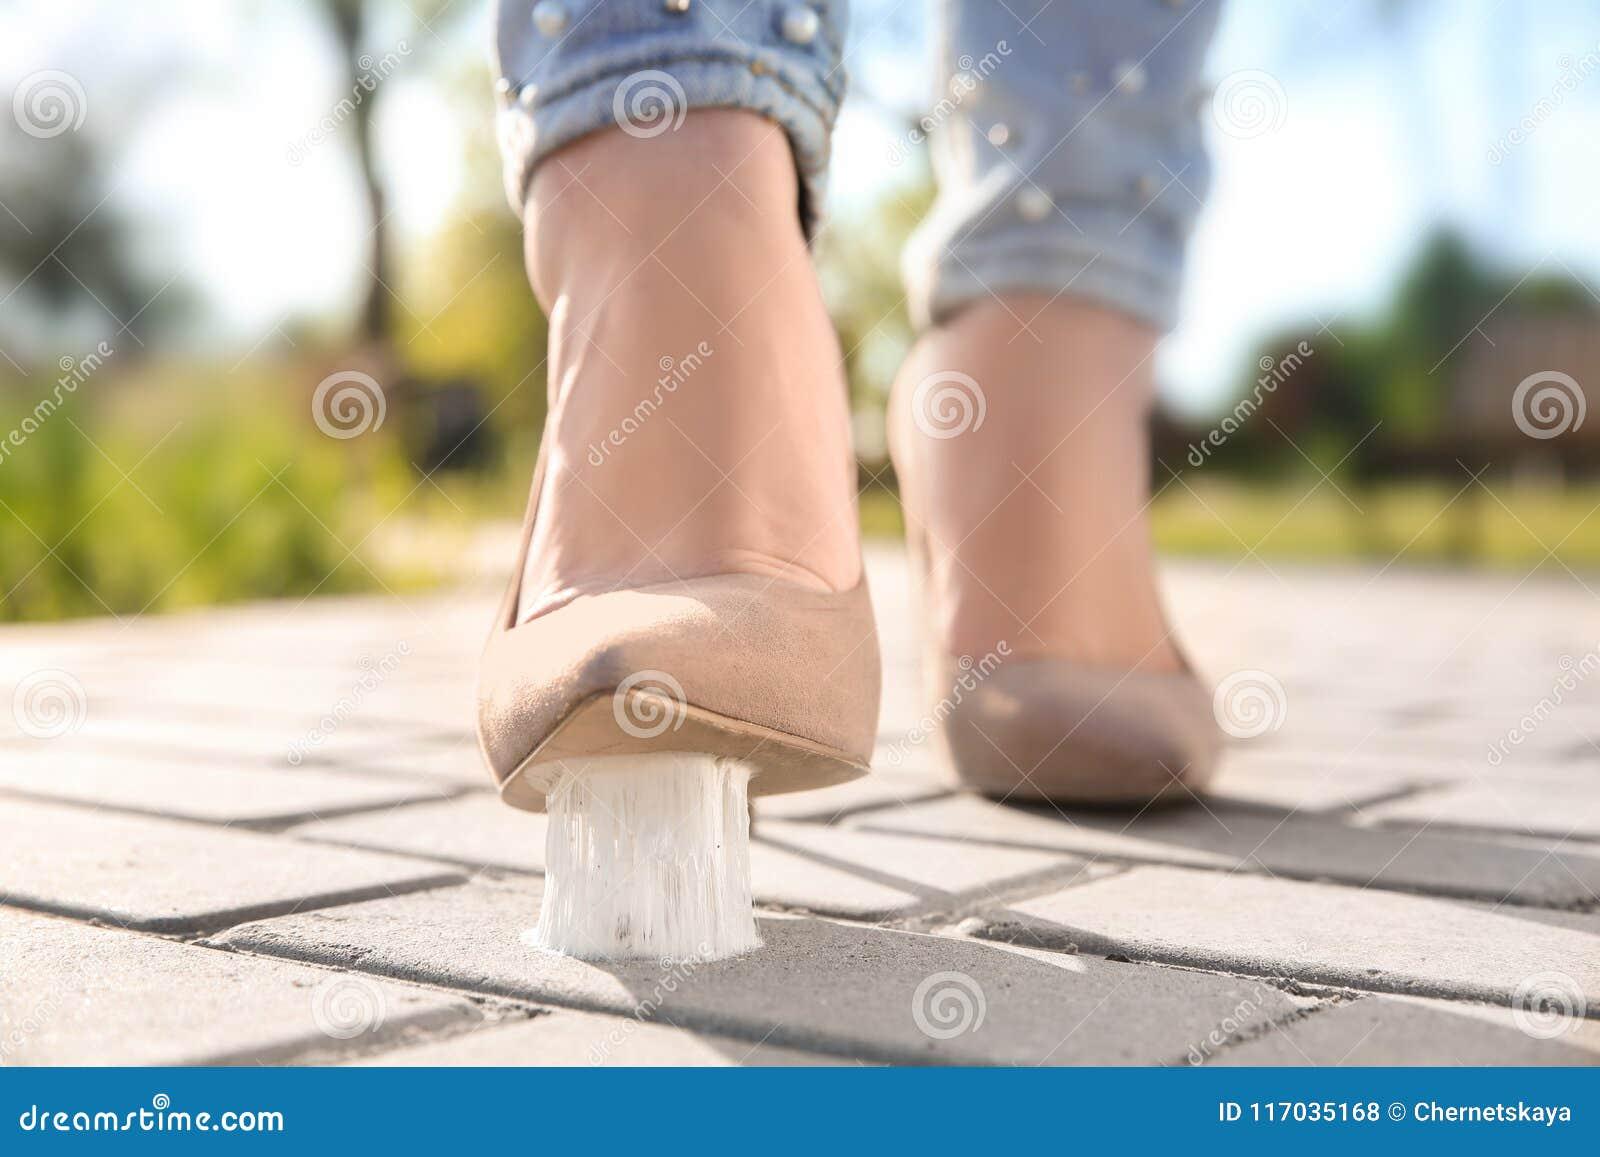 Kvinna som kliver i tuggummi på trottoaren